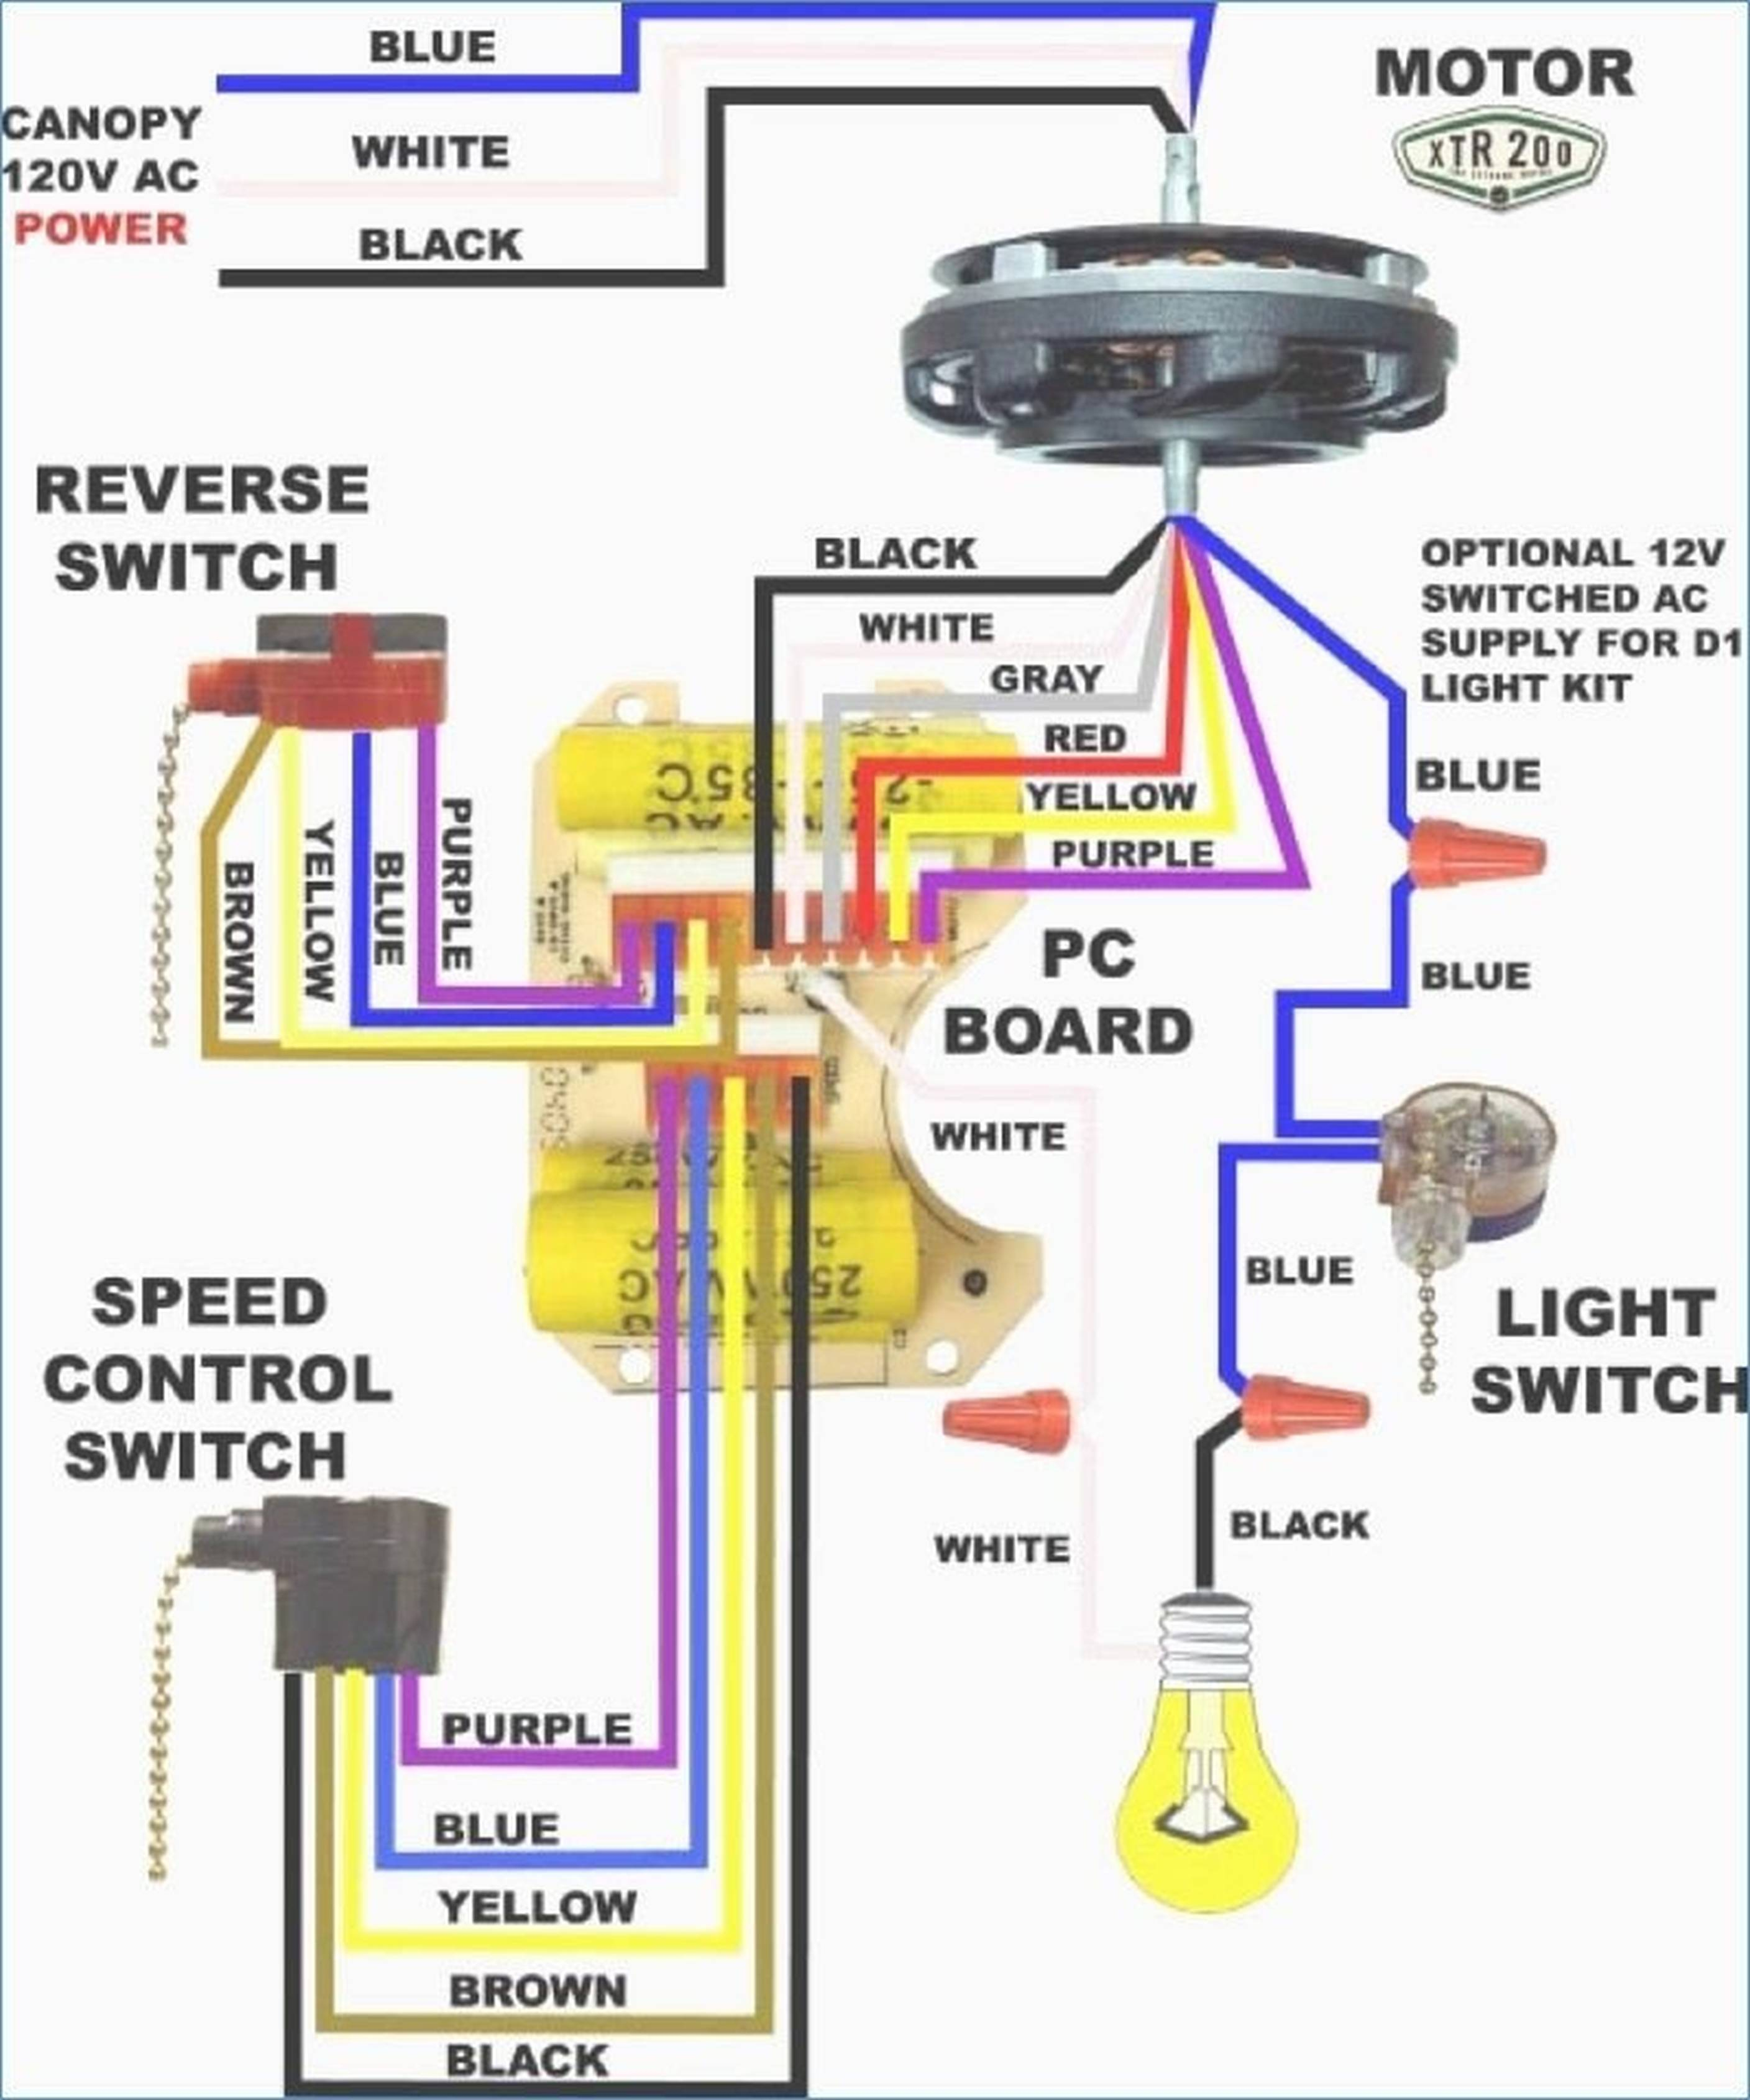 Zing Ear Switch Wiring Diagram Hampton Bay | Wiring Diagram - Hampton Bay Ceiling Fan Wiring Diagram